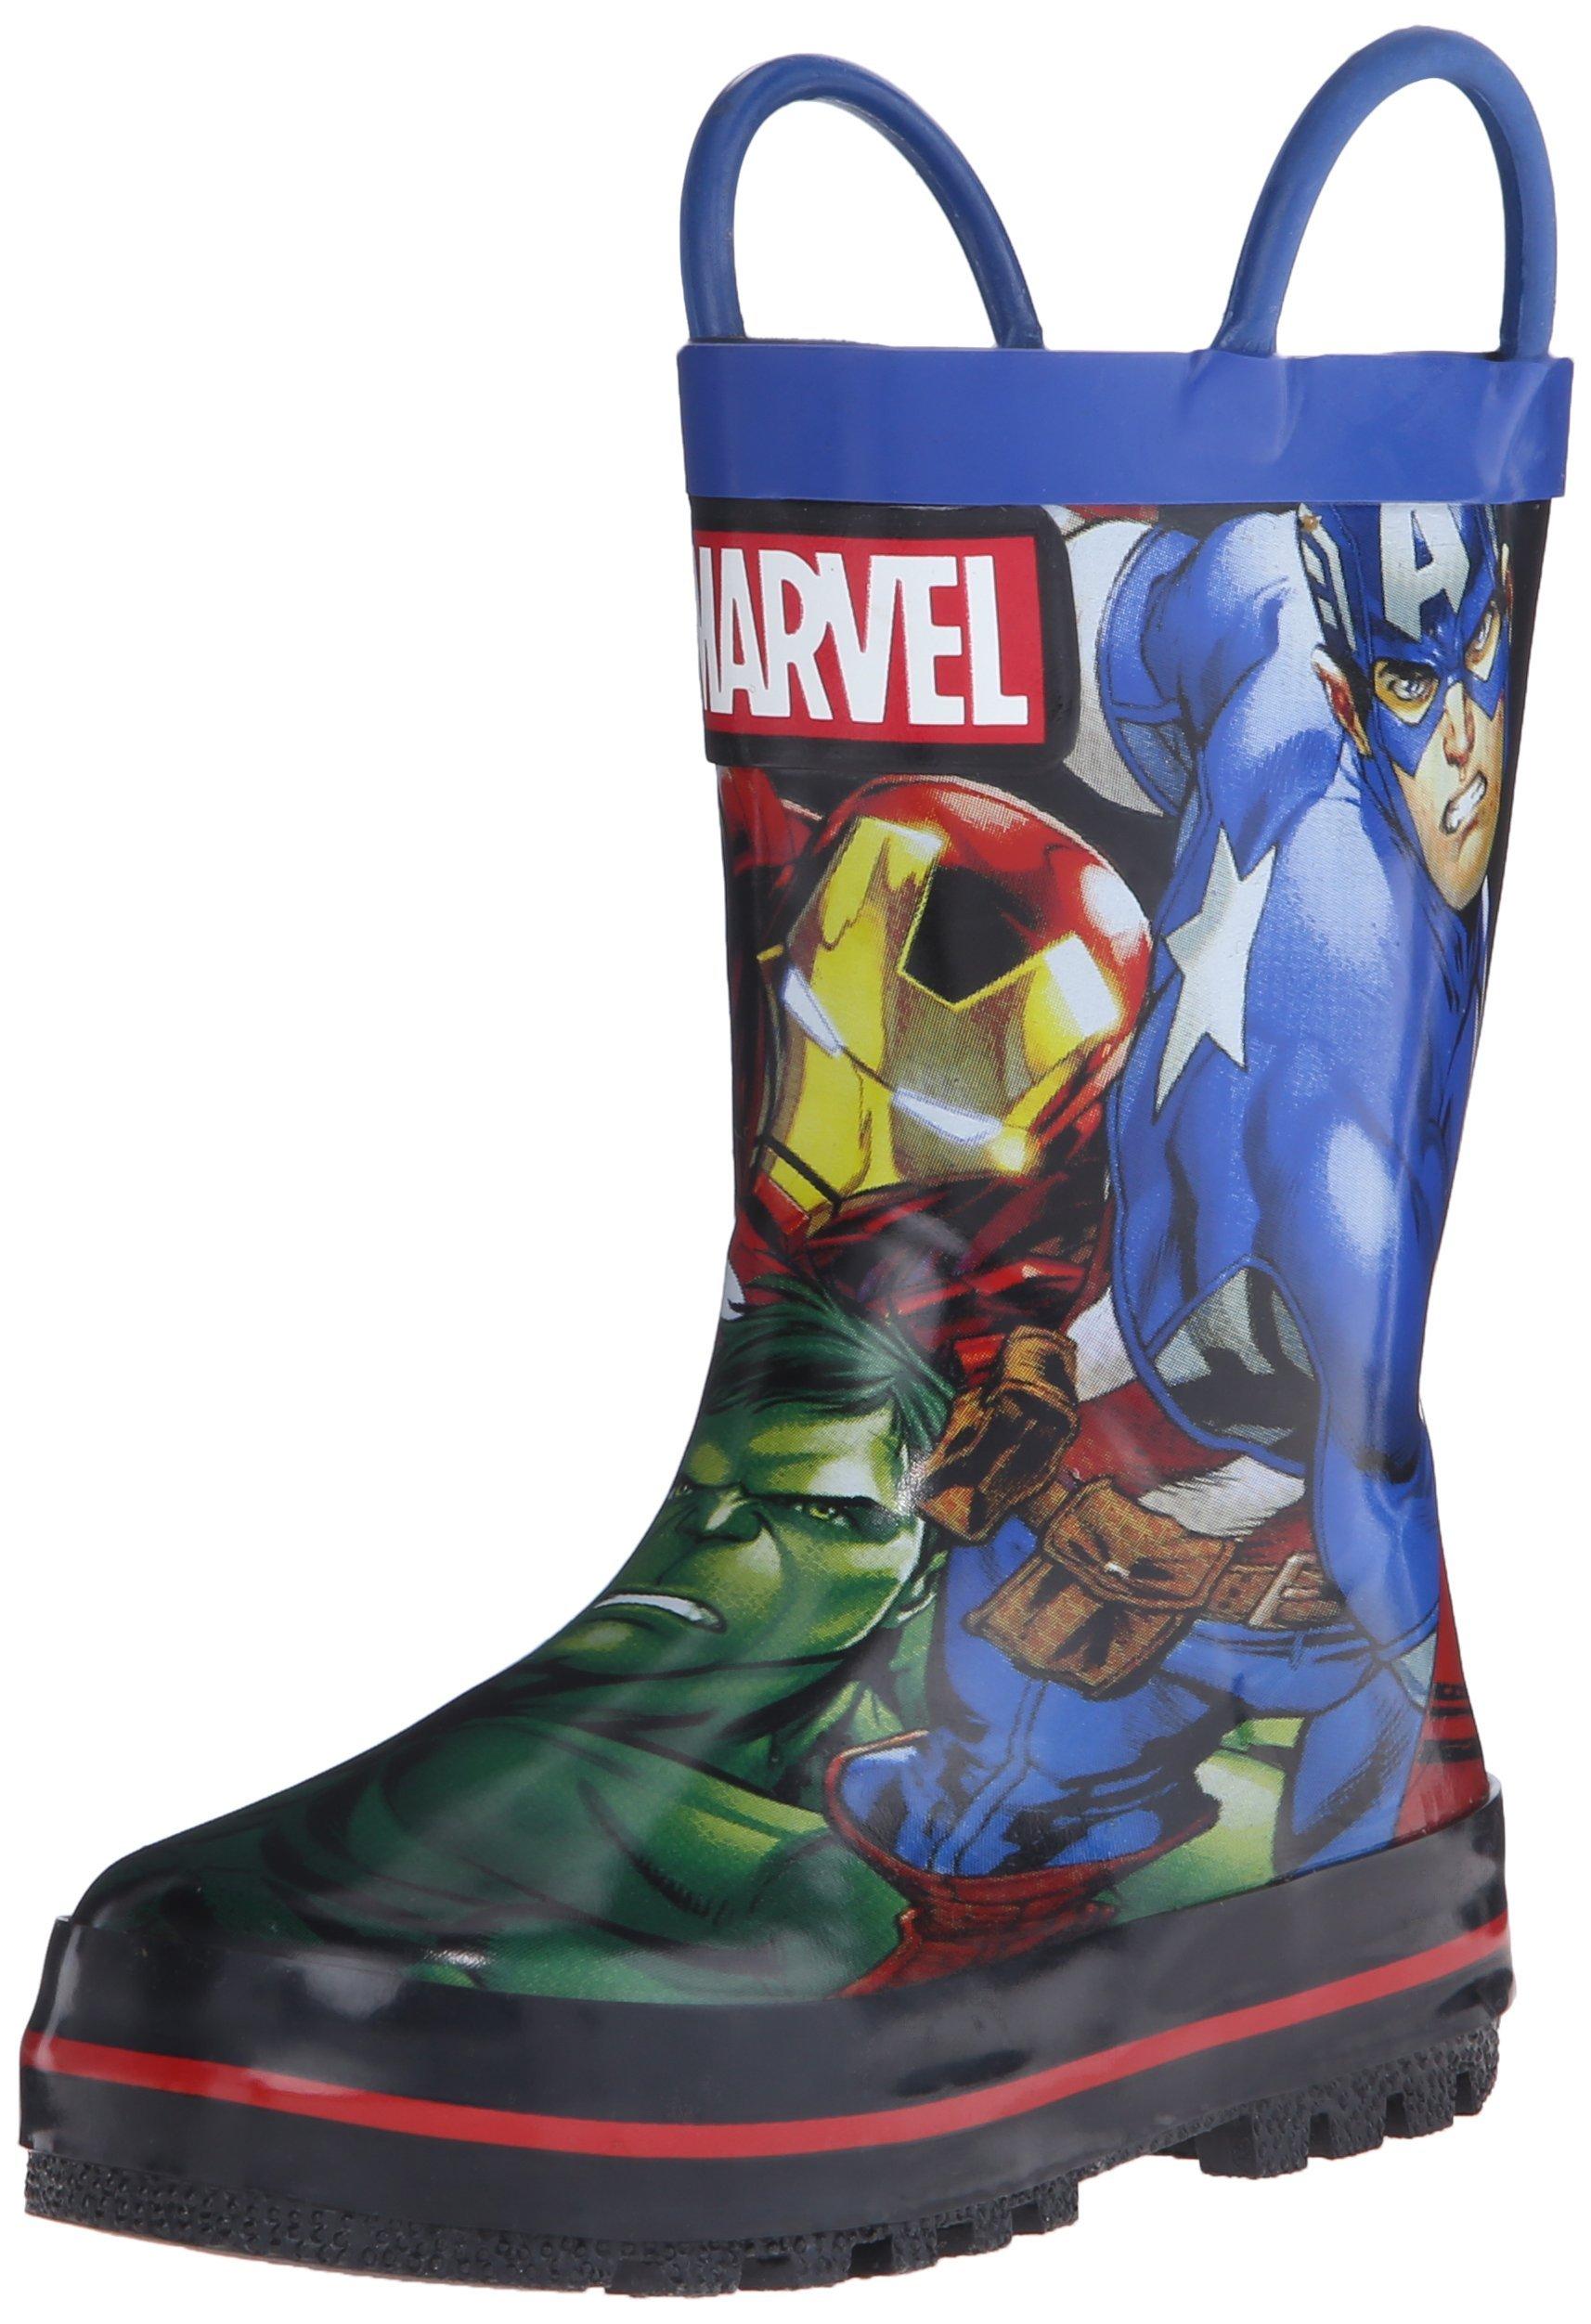 Marvel Boys Rain Boots Toddler/Little Kid, Multi